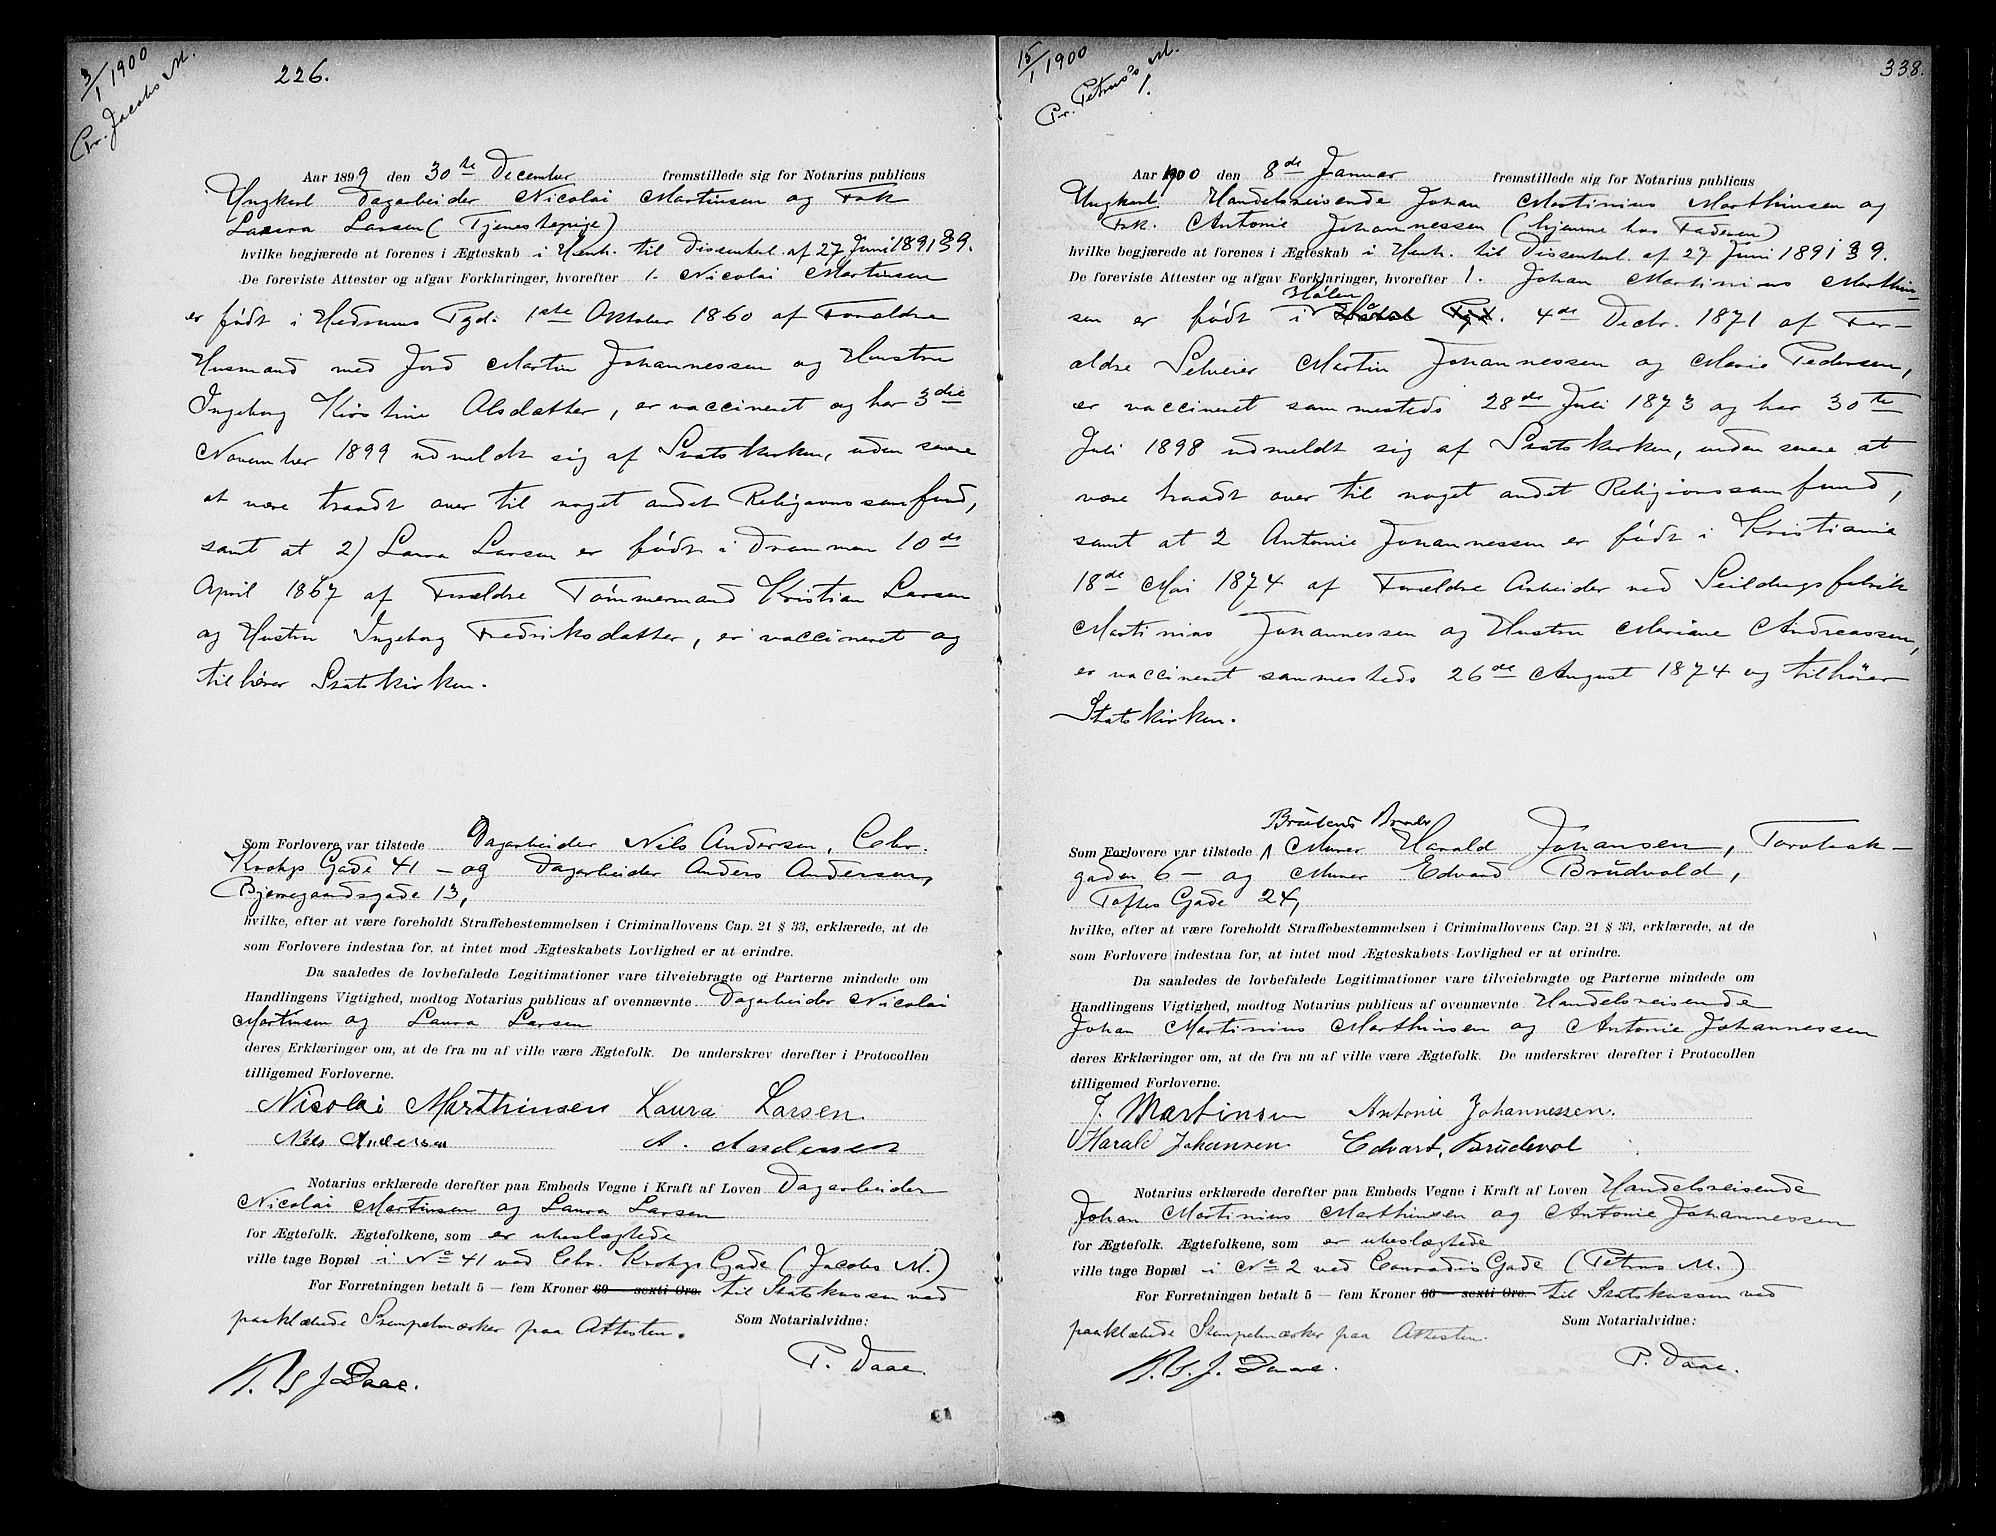 SAO, Oslo byfogd avd. I, L/Lb/Lbb/L0004: Notarialprotokoll, rekke II: Vigsler, 1897-1902, s. 337b-338a